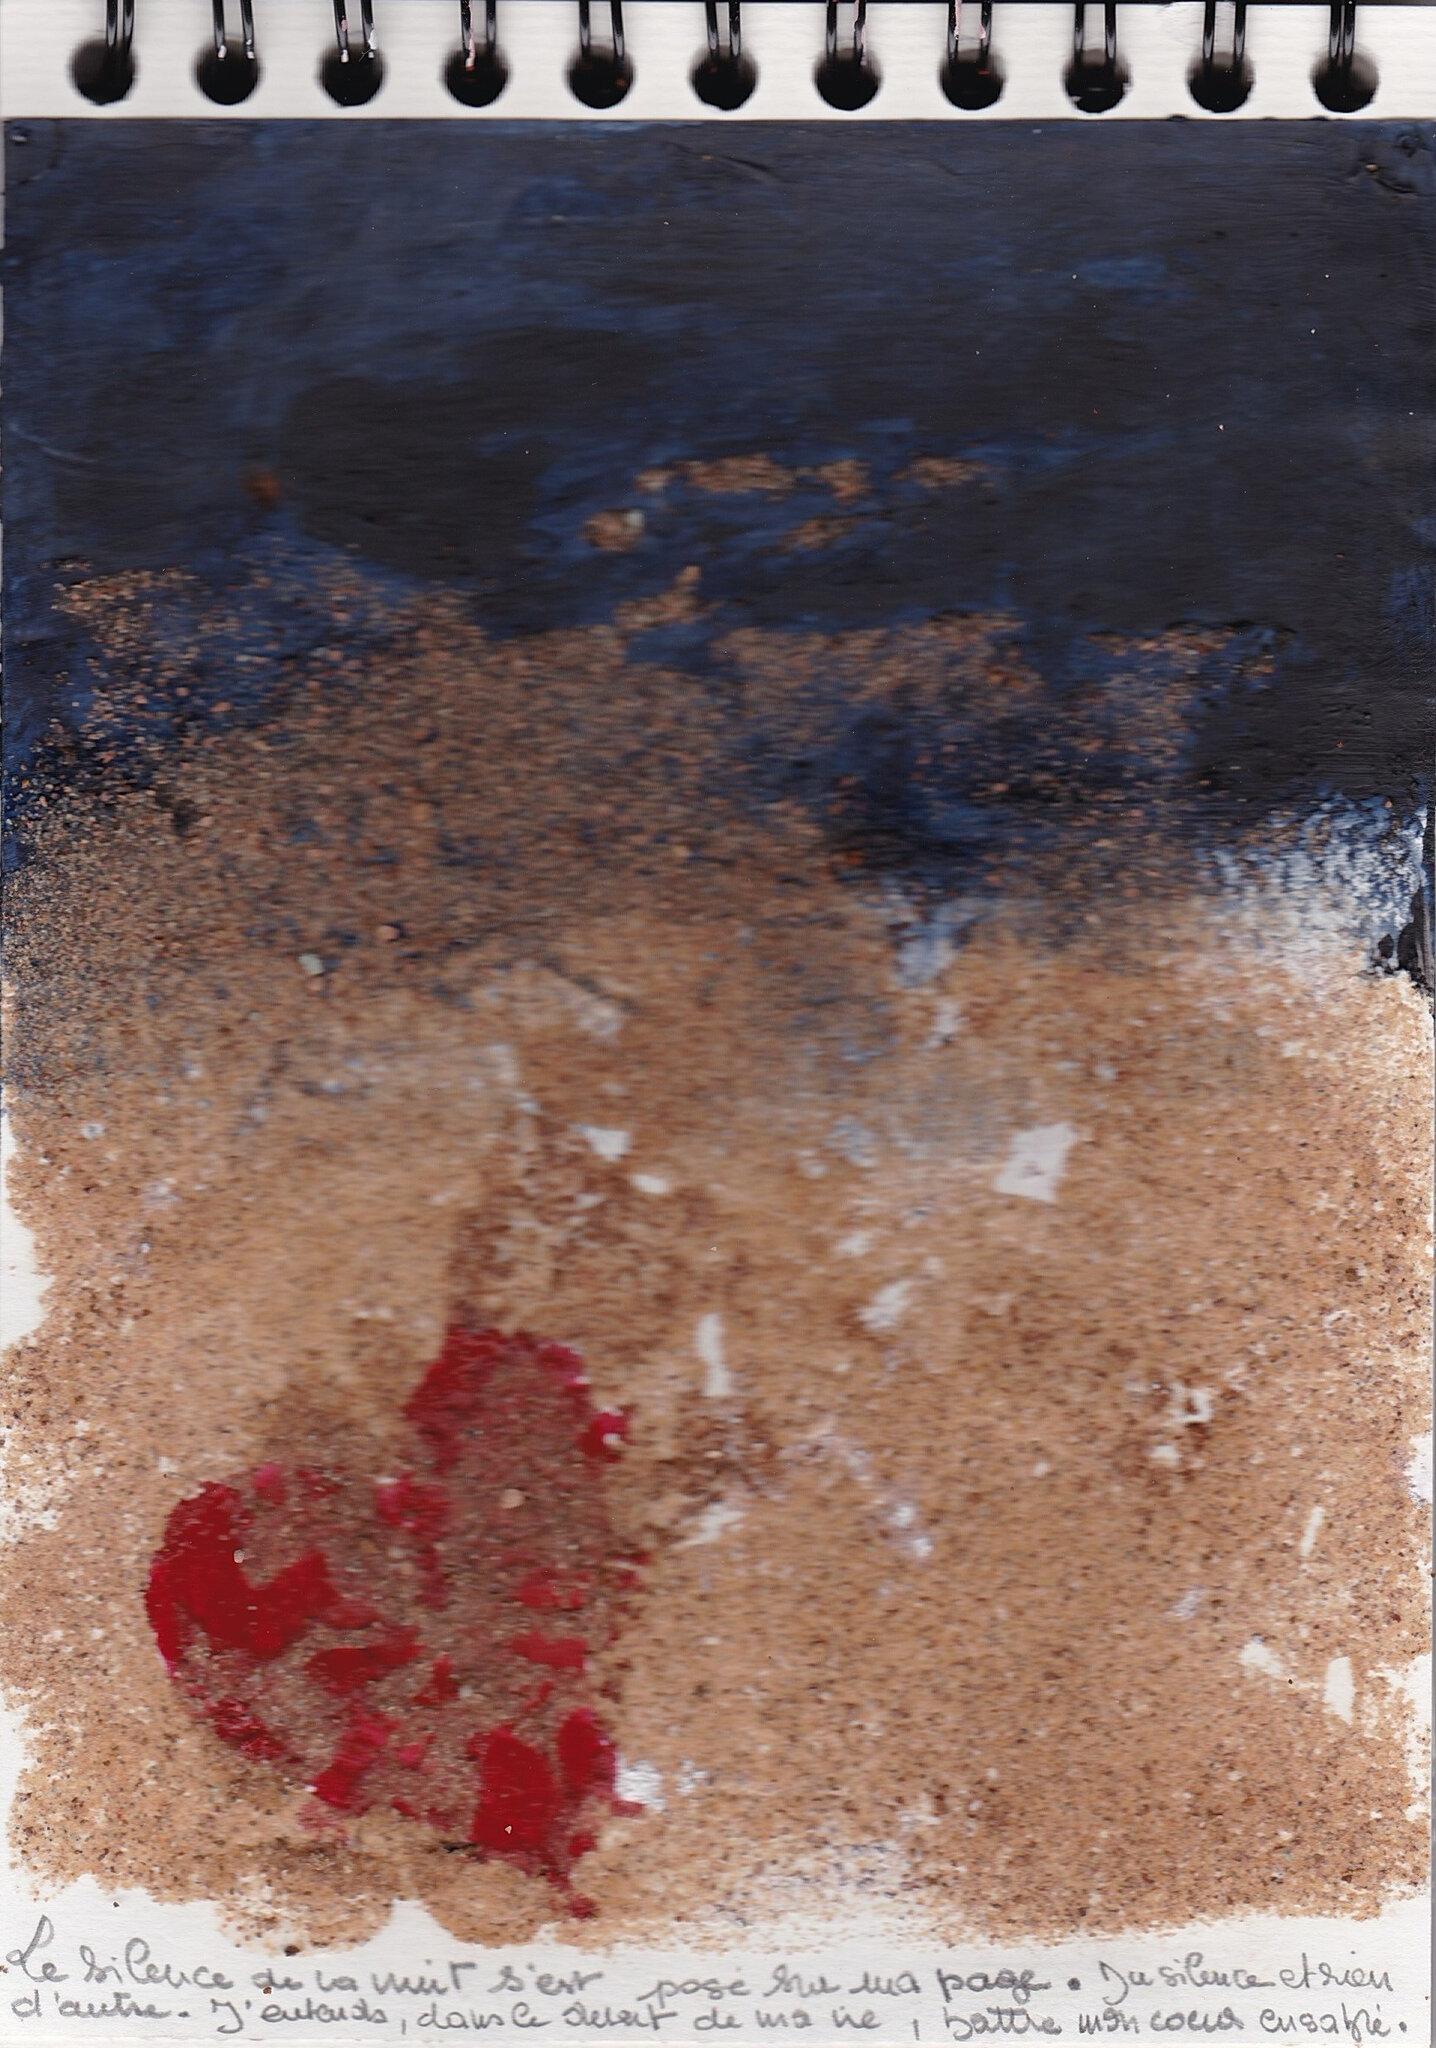 Le cœur cousu. Marylise Gillard.